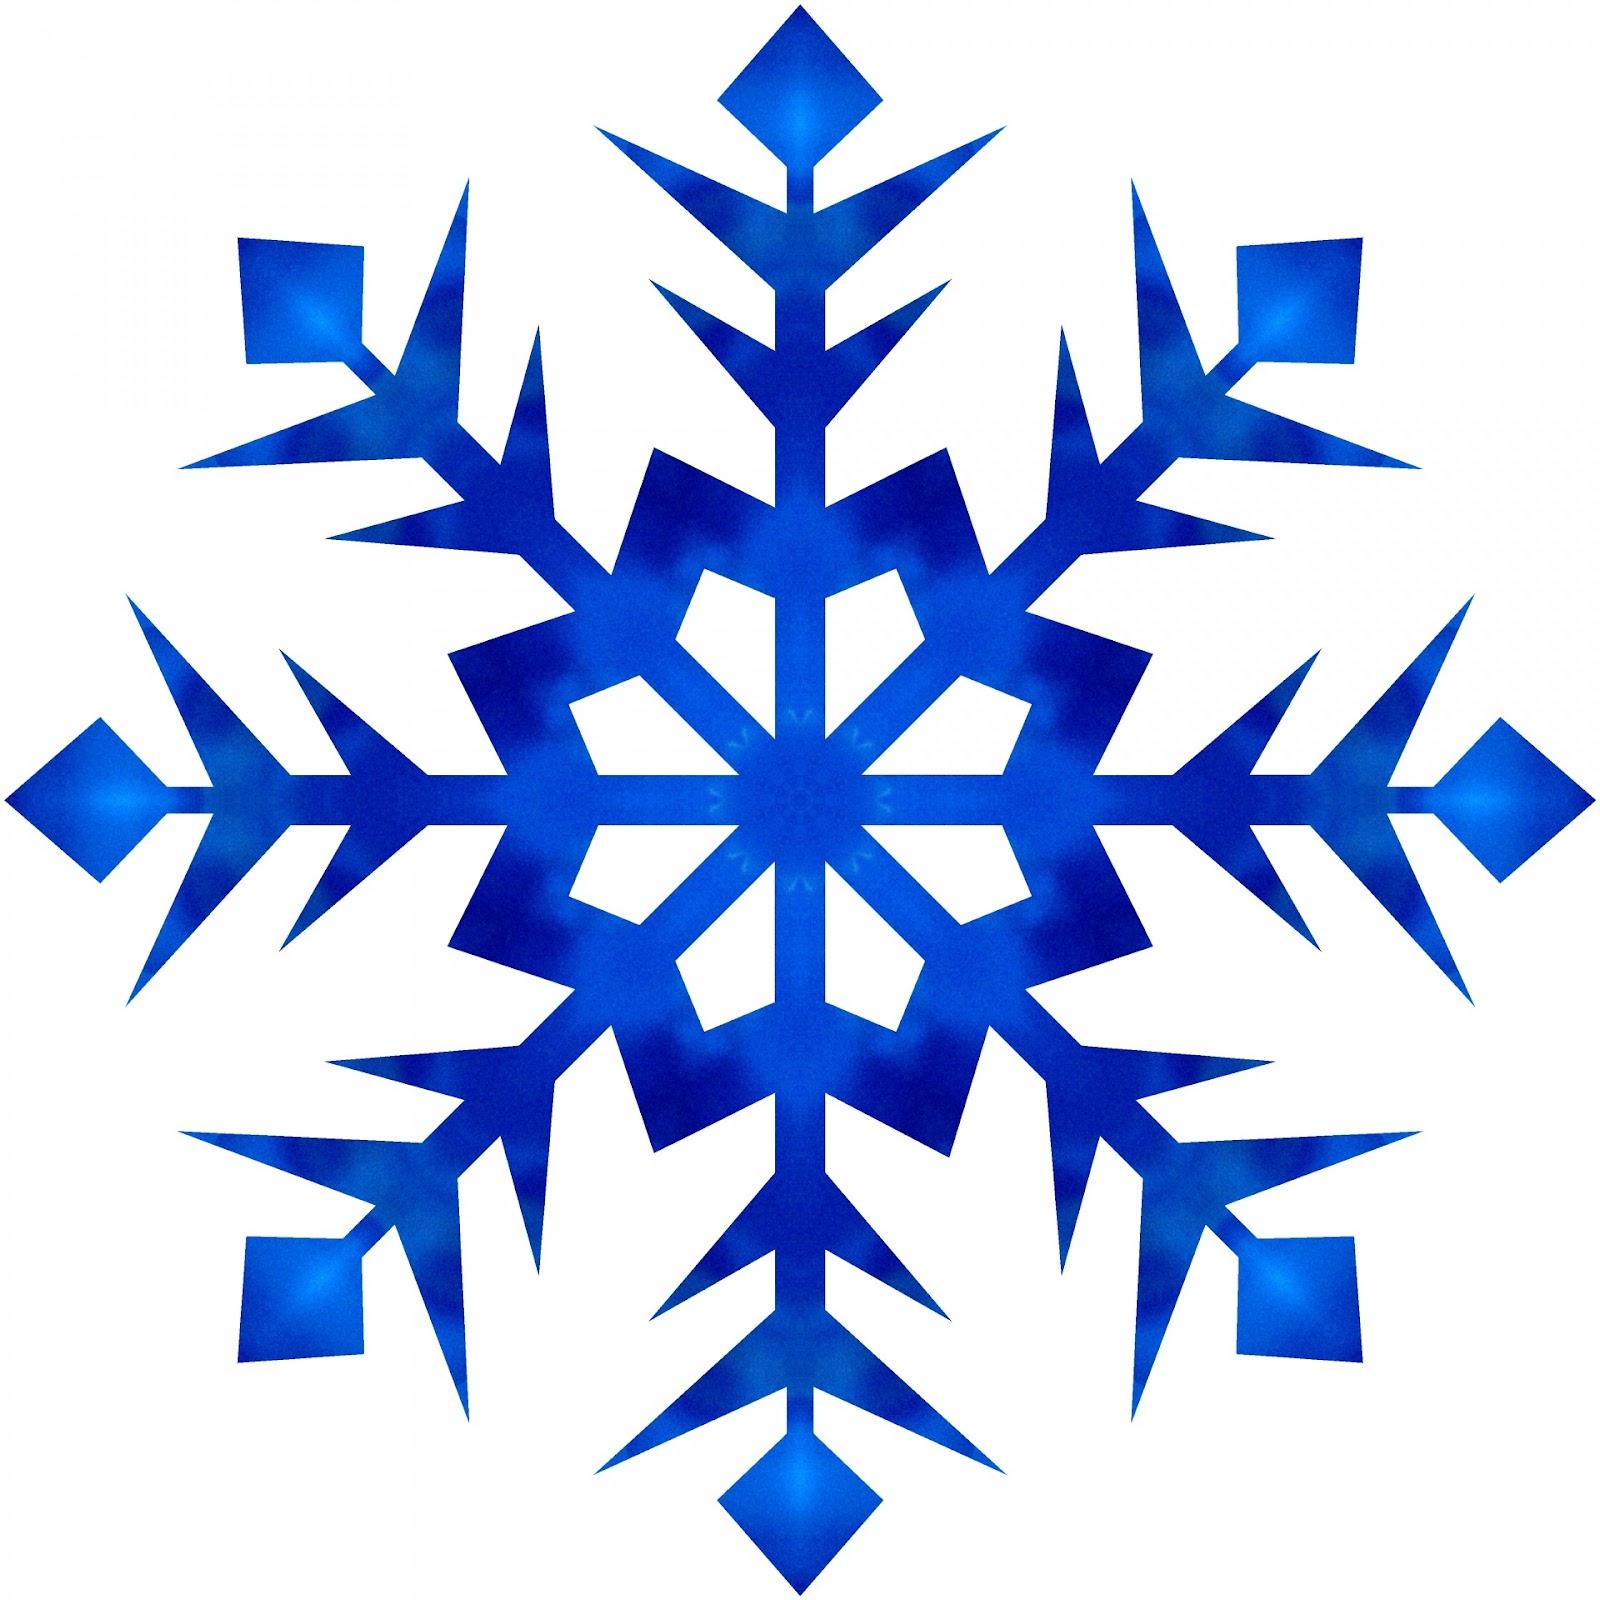 http://www.publicdomainpictures.net/pictures/130000/velka/blue-drop-snowflake.jpg